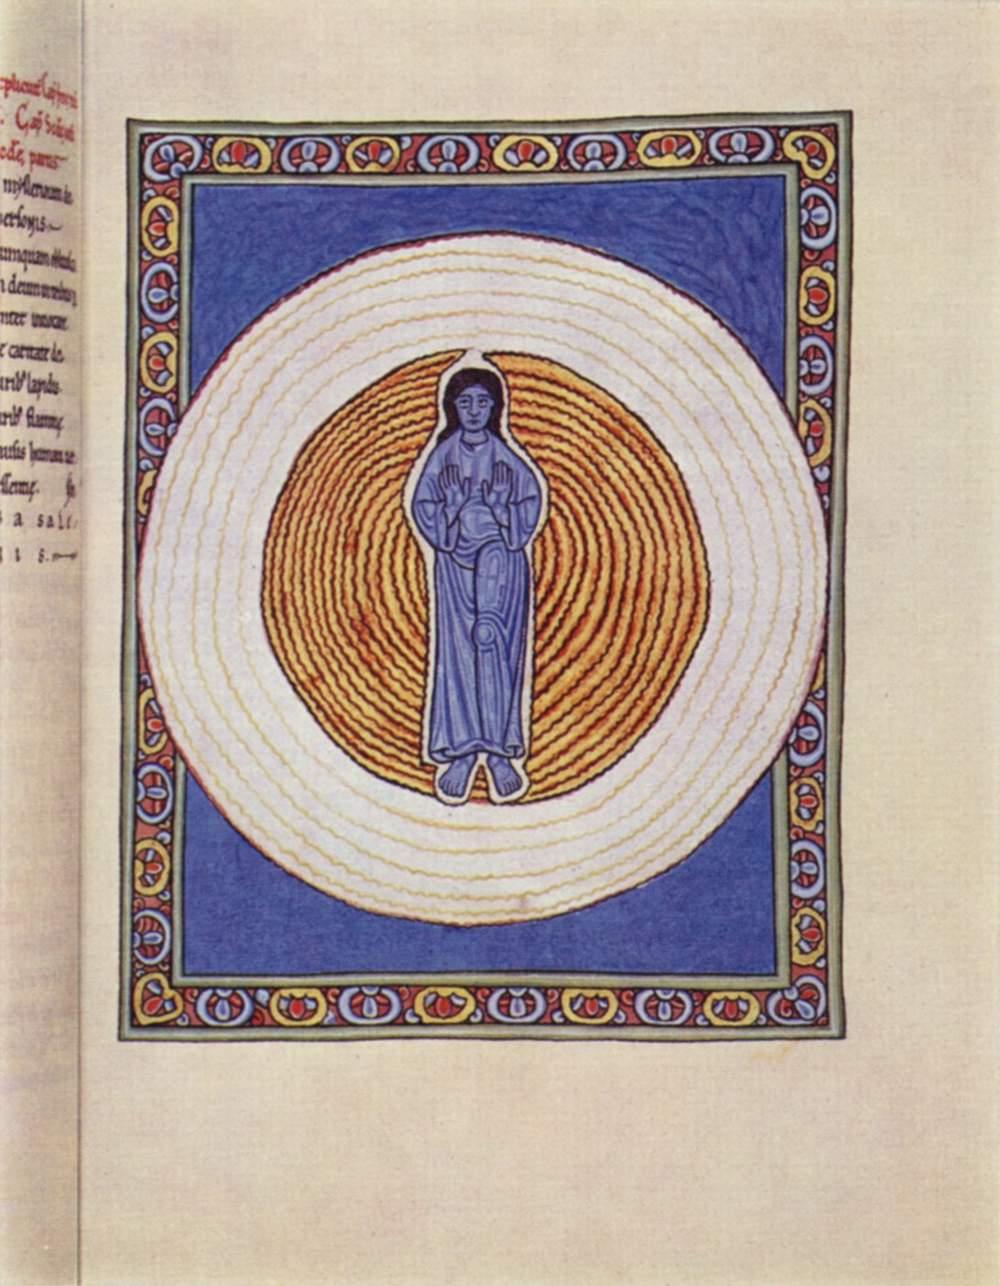 https://i0.wp.com/upload.wikimedia.org/wikipedia/commons/f/f6/Meister_des_Hildegardis-Codex_003.jpg